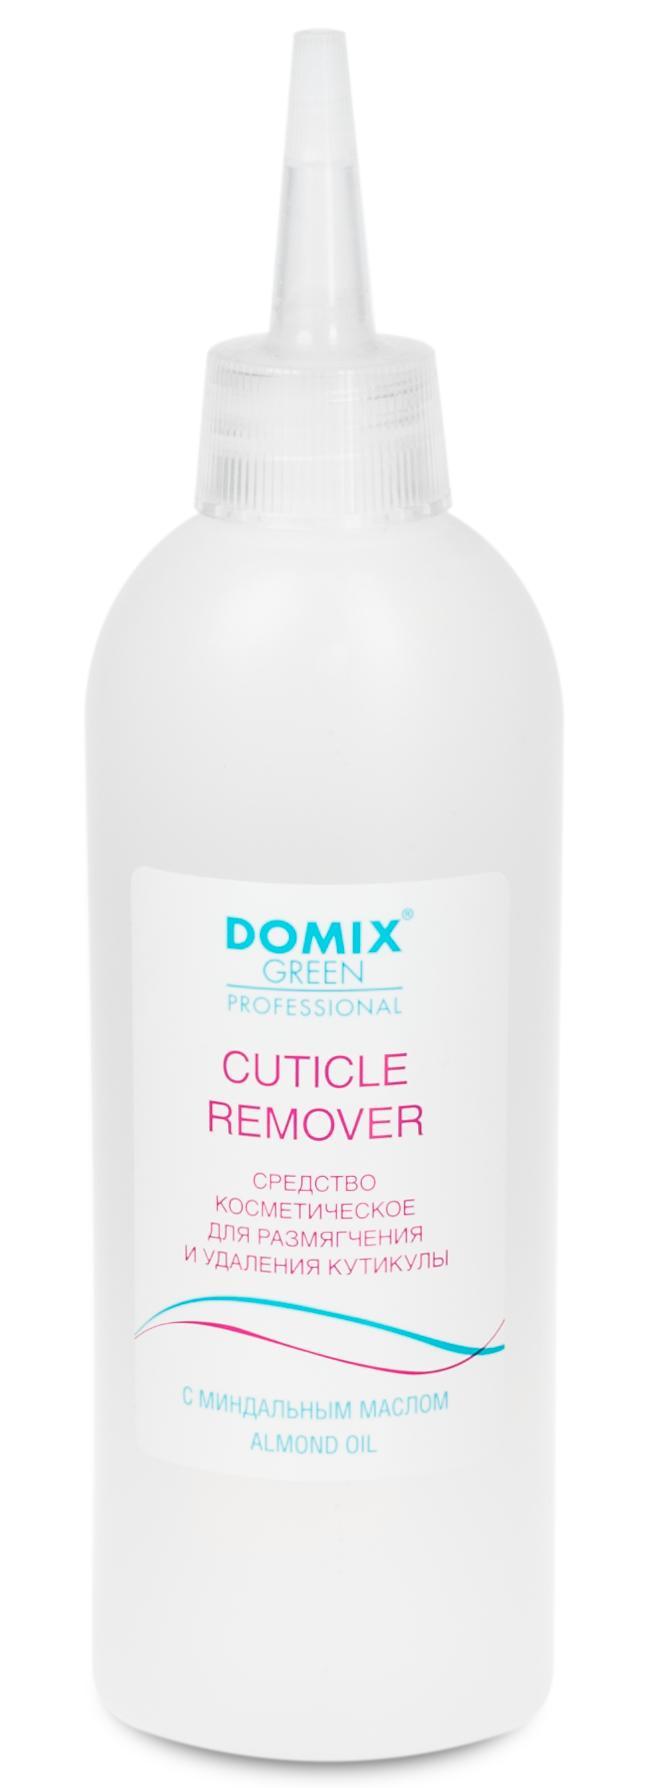 DOMIX Средство для удаления кутикулы / Cuticle Remover DGP 200 мл